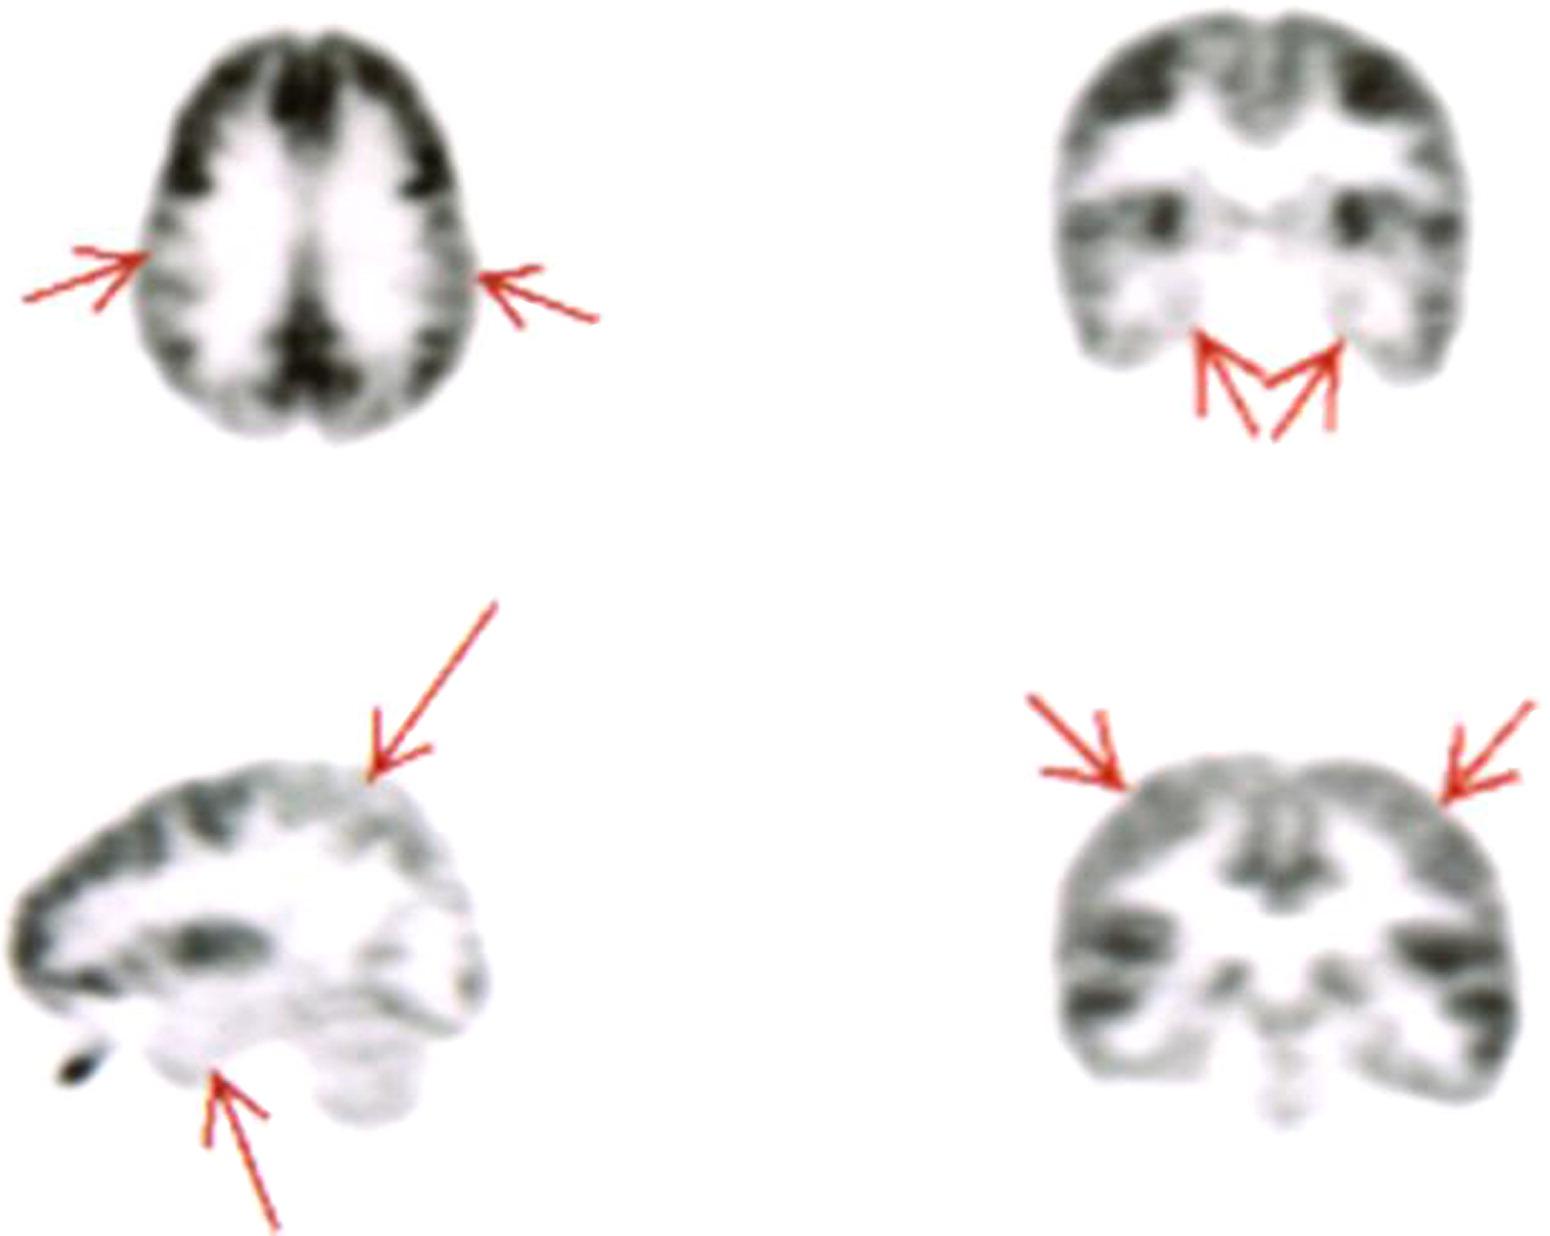 Brain Injury In Boxing